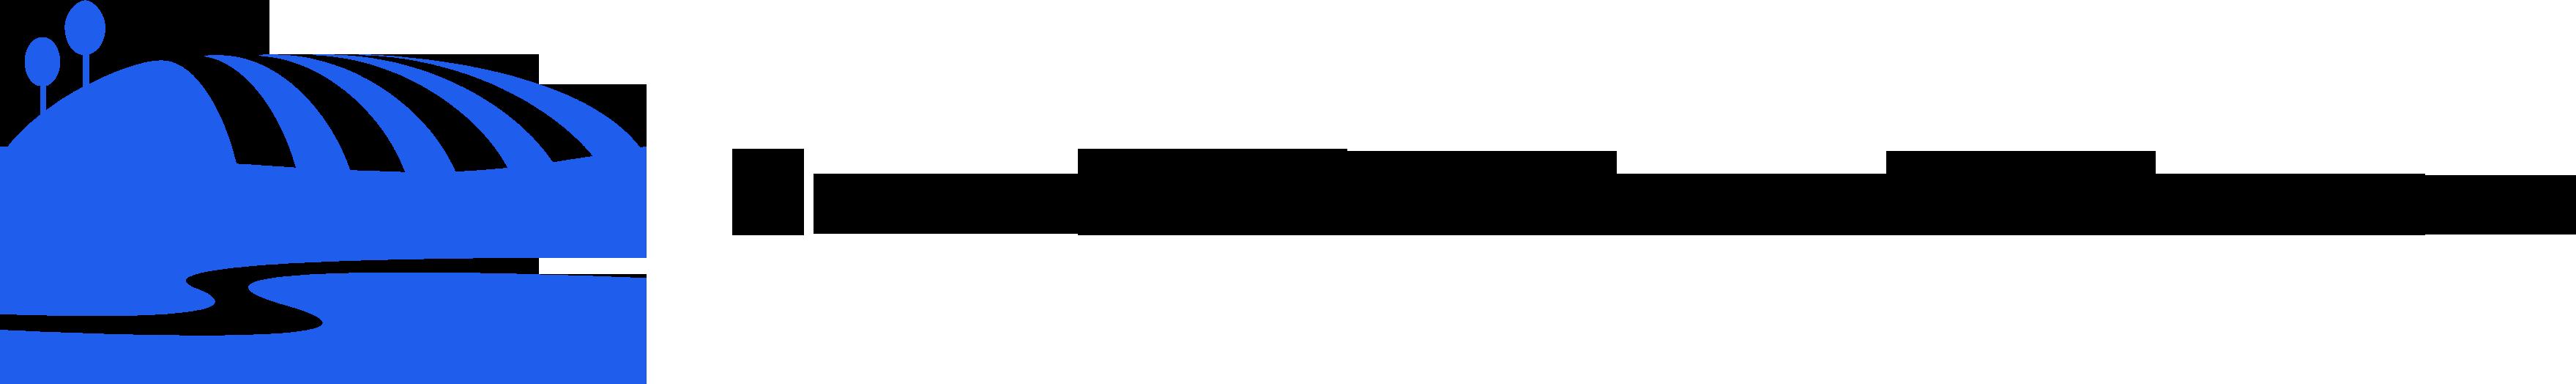 Color-logo---no-background